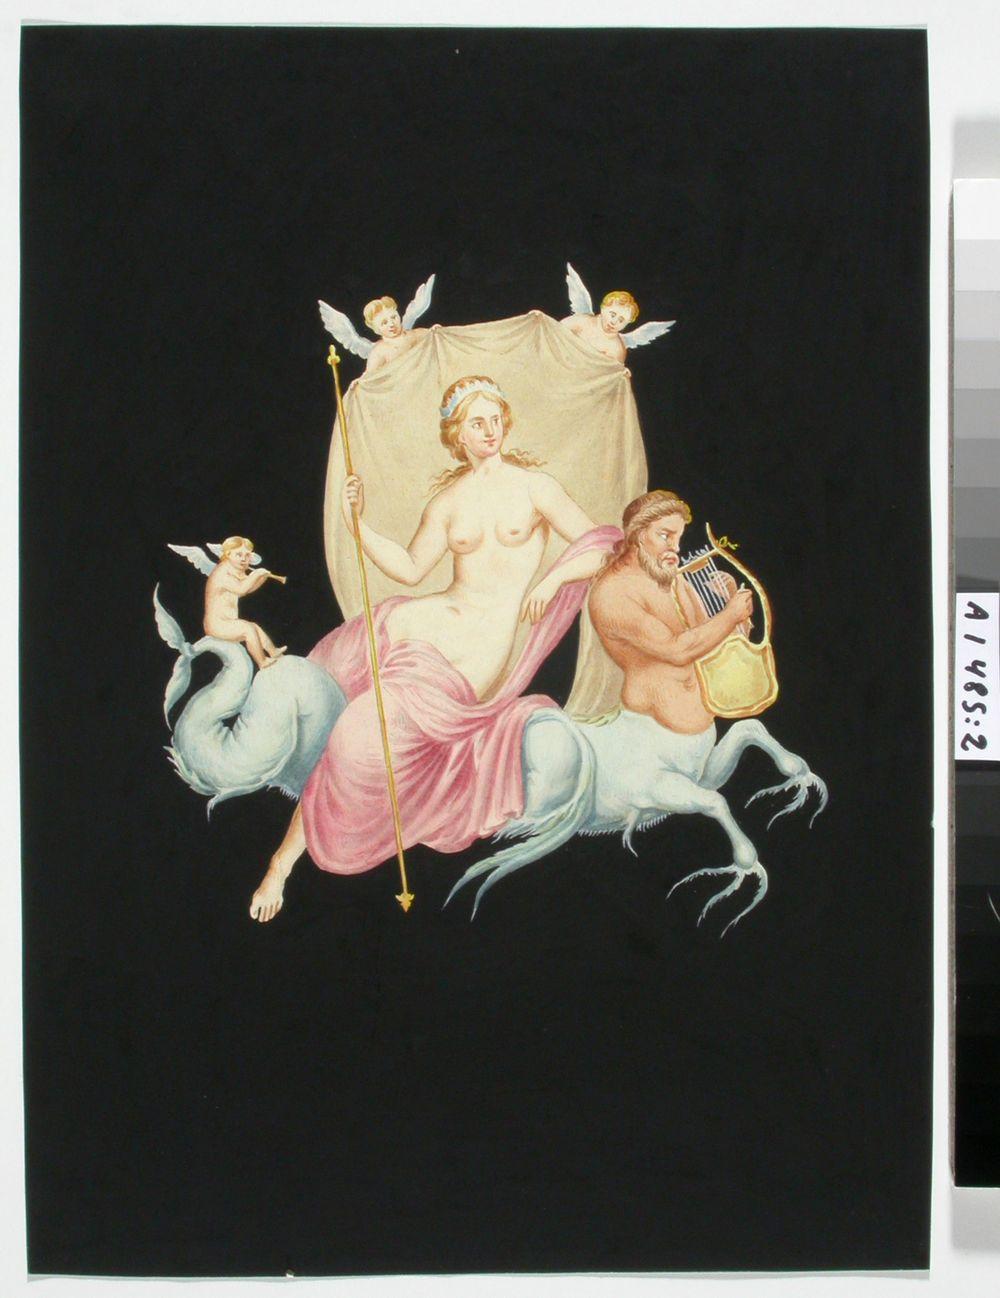 Kopio Pompejin maalauksista